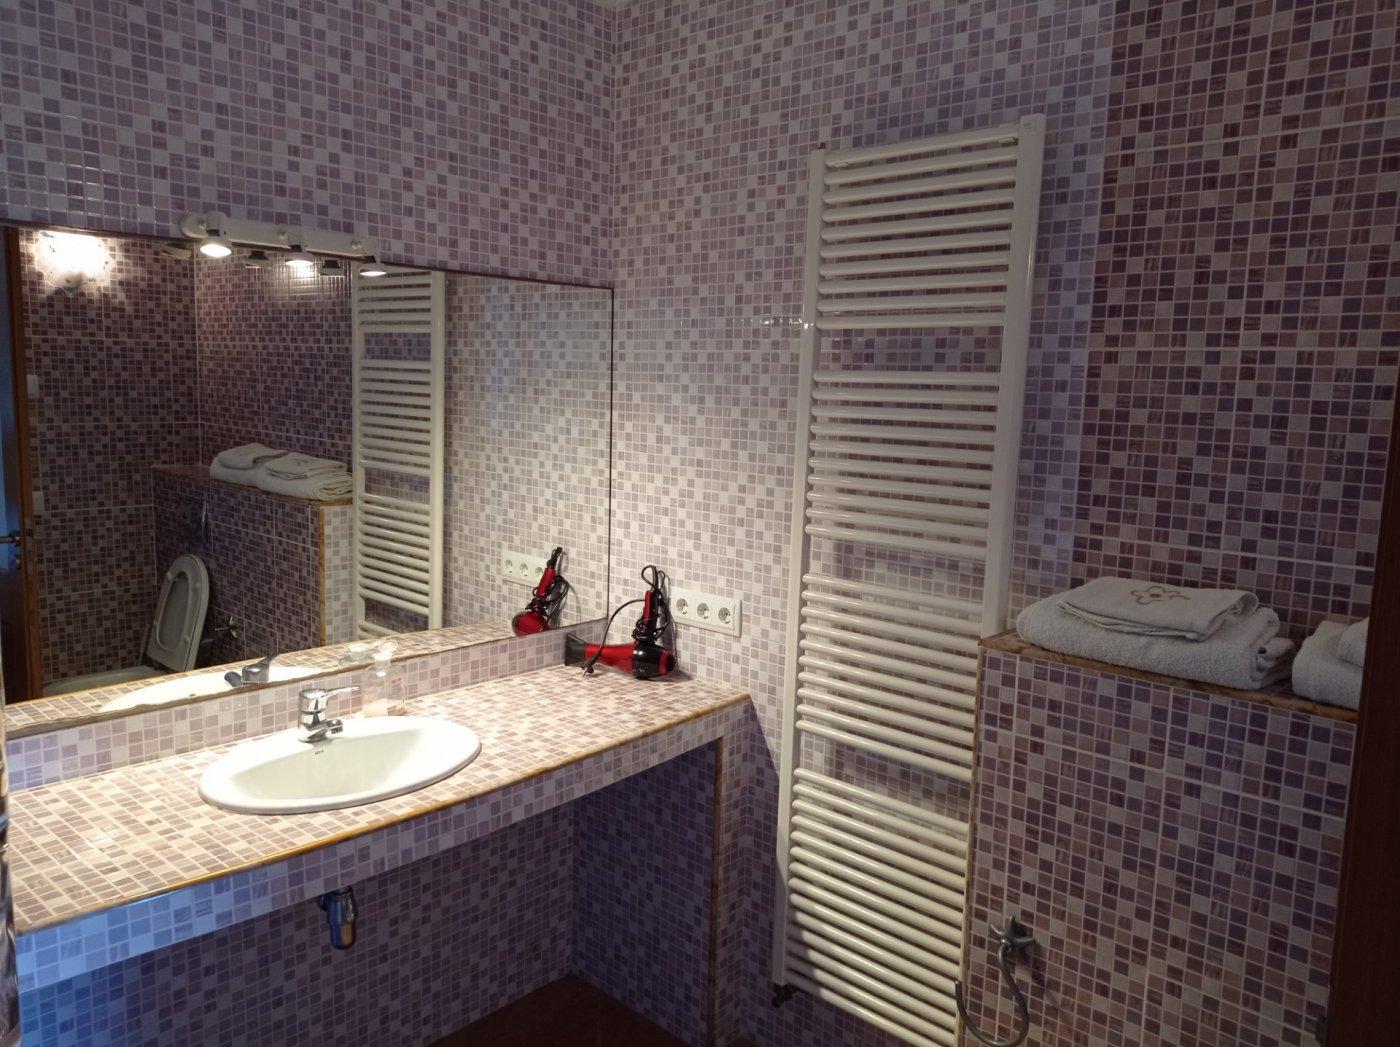 Finca es vinyet hotel boutique for sale in petra - imagenInmueble23